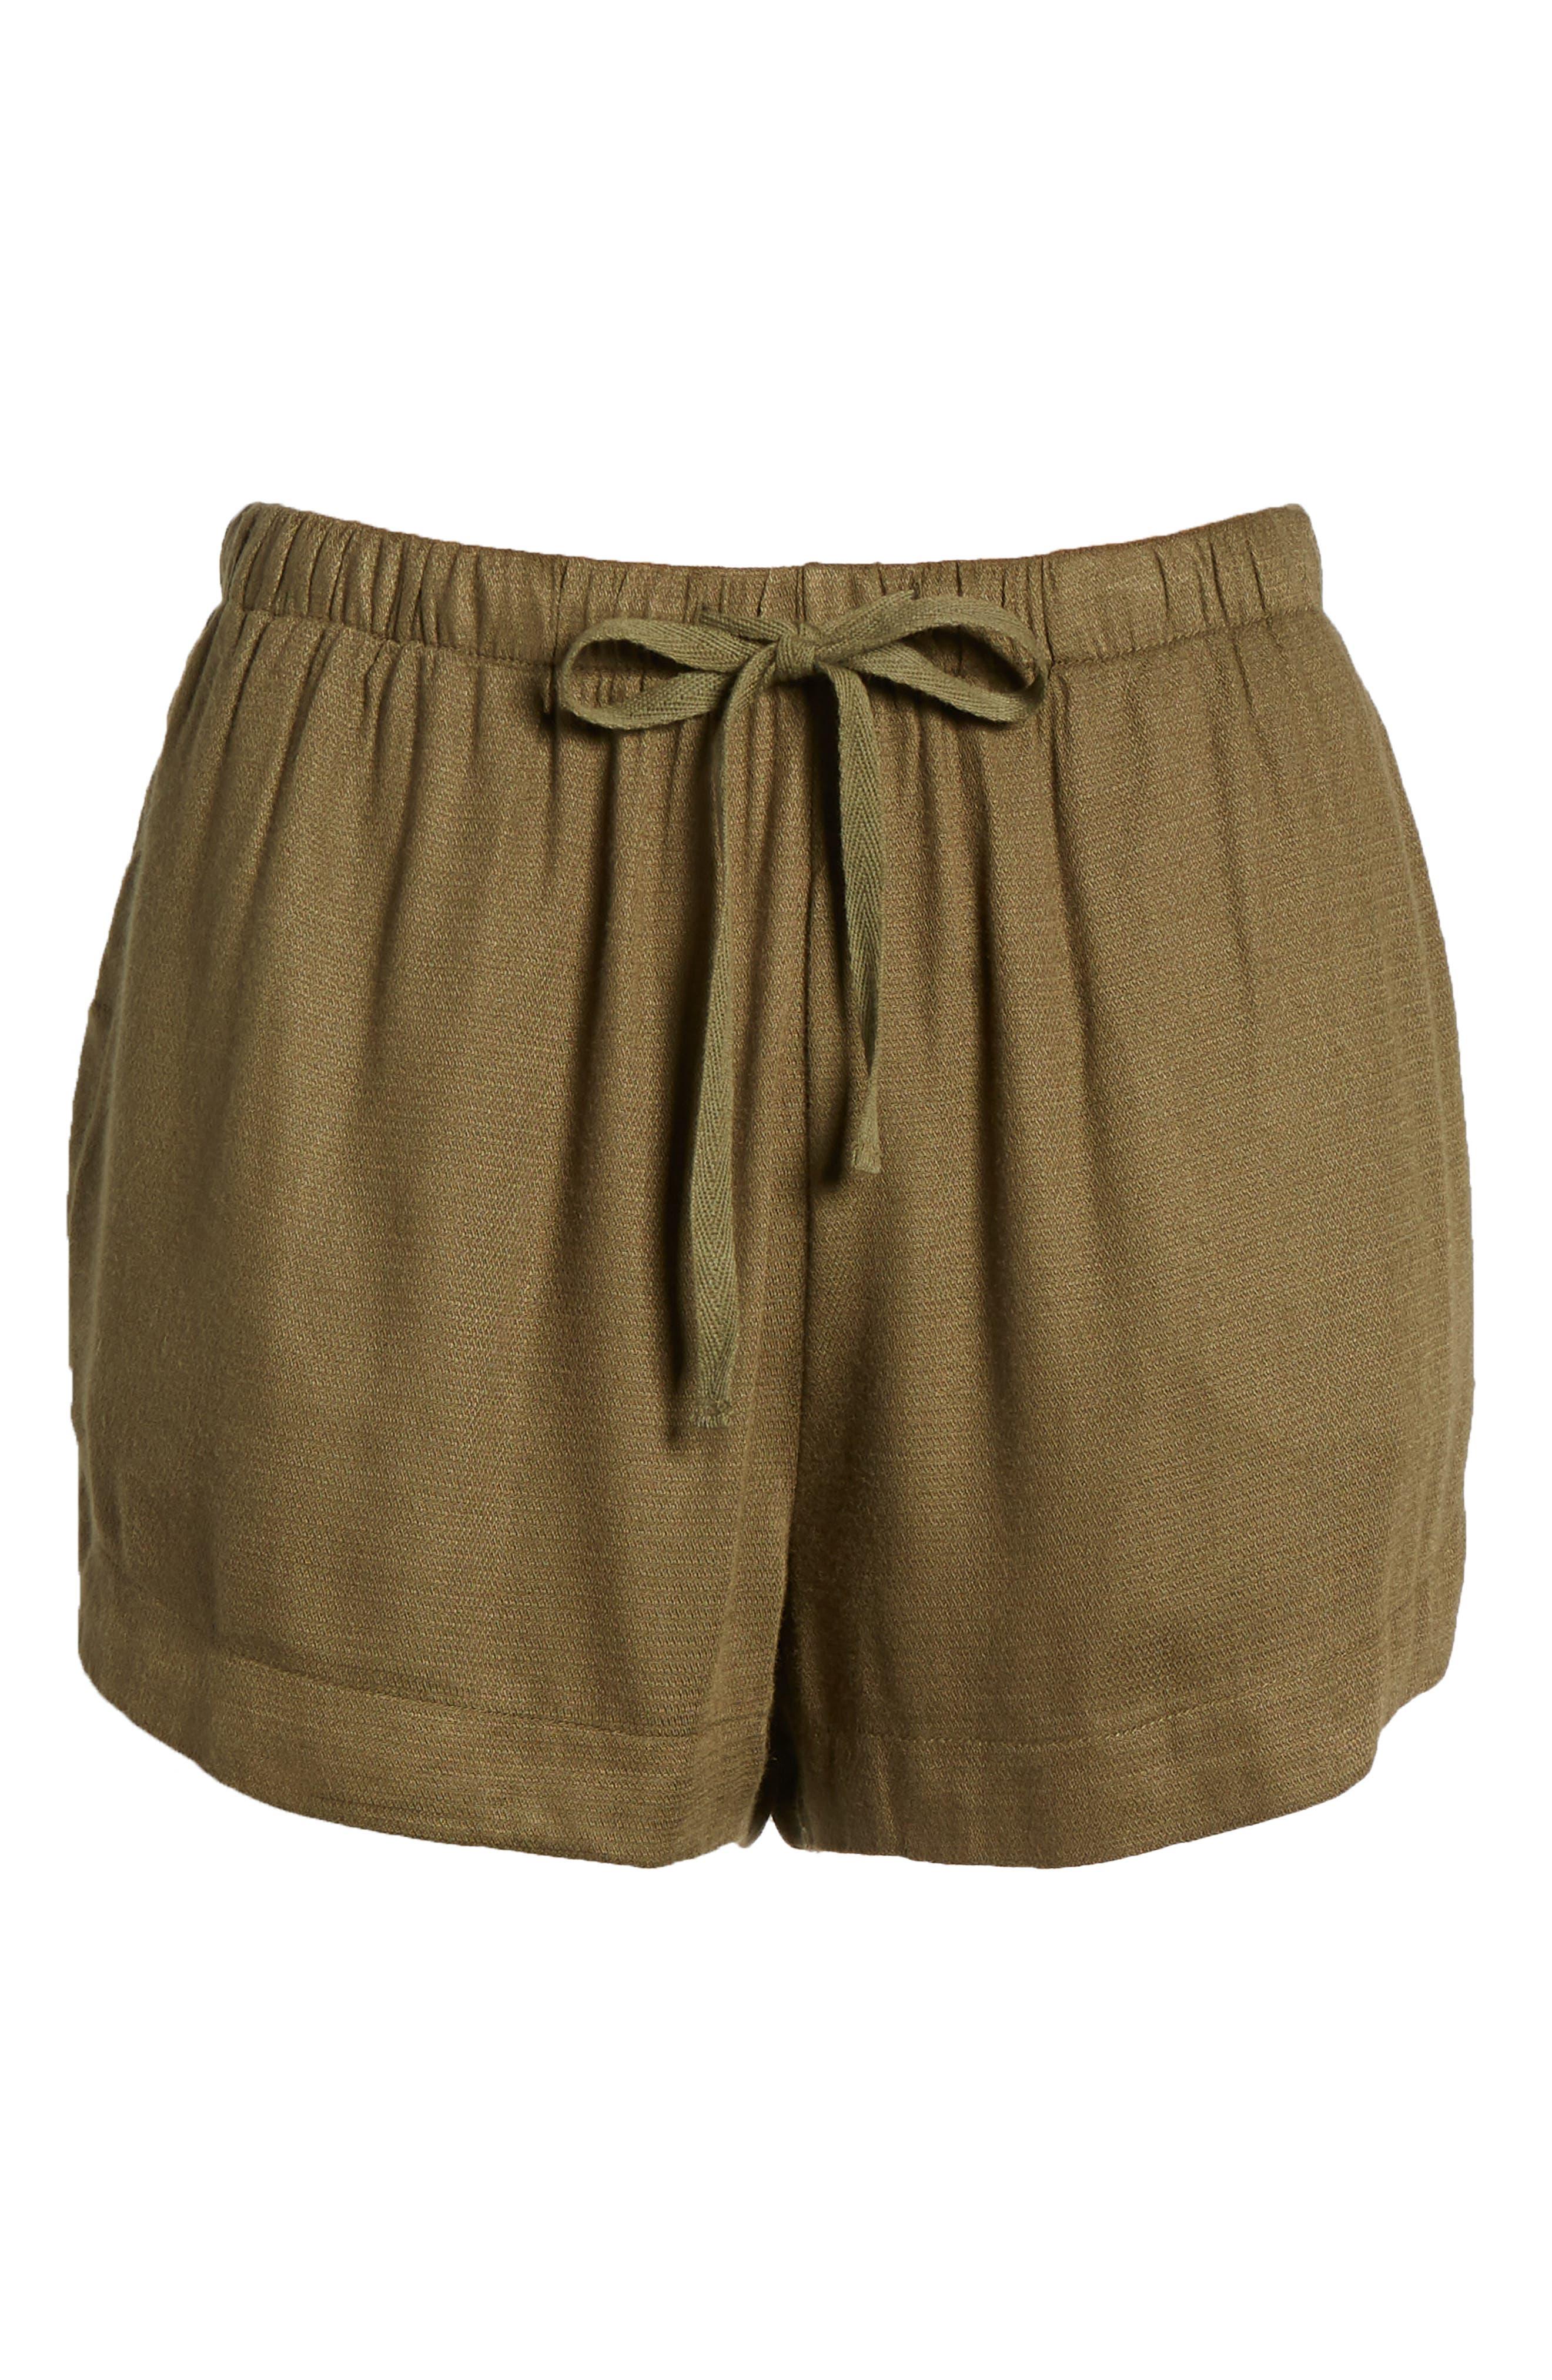 Vary Yume Shorts,                             Alternate thumbnail 7, color,                             340